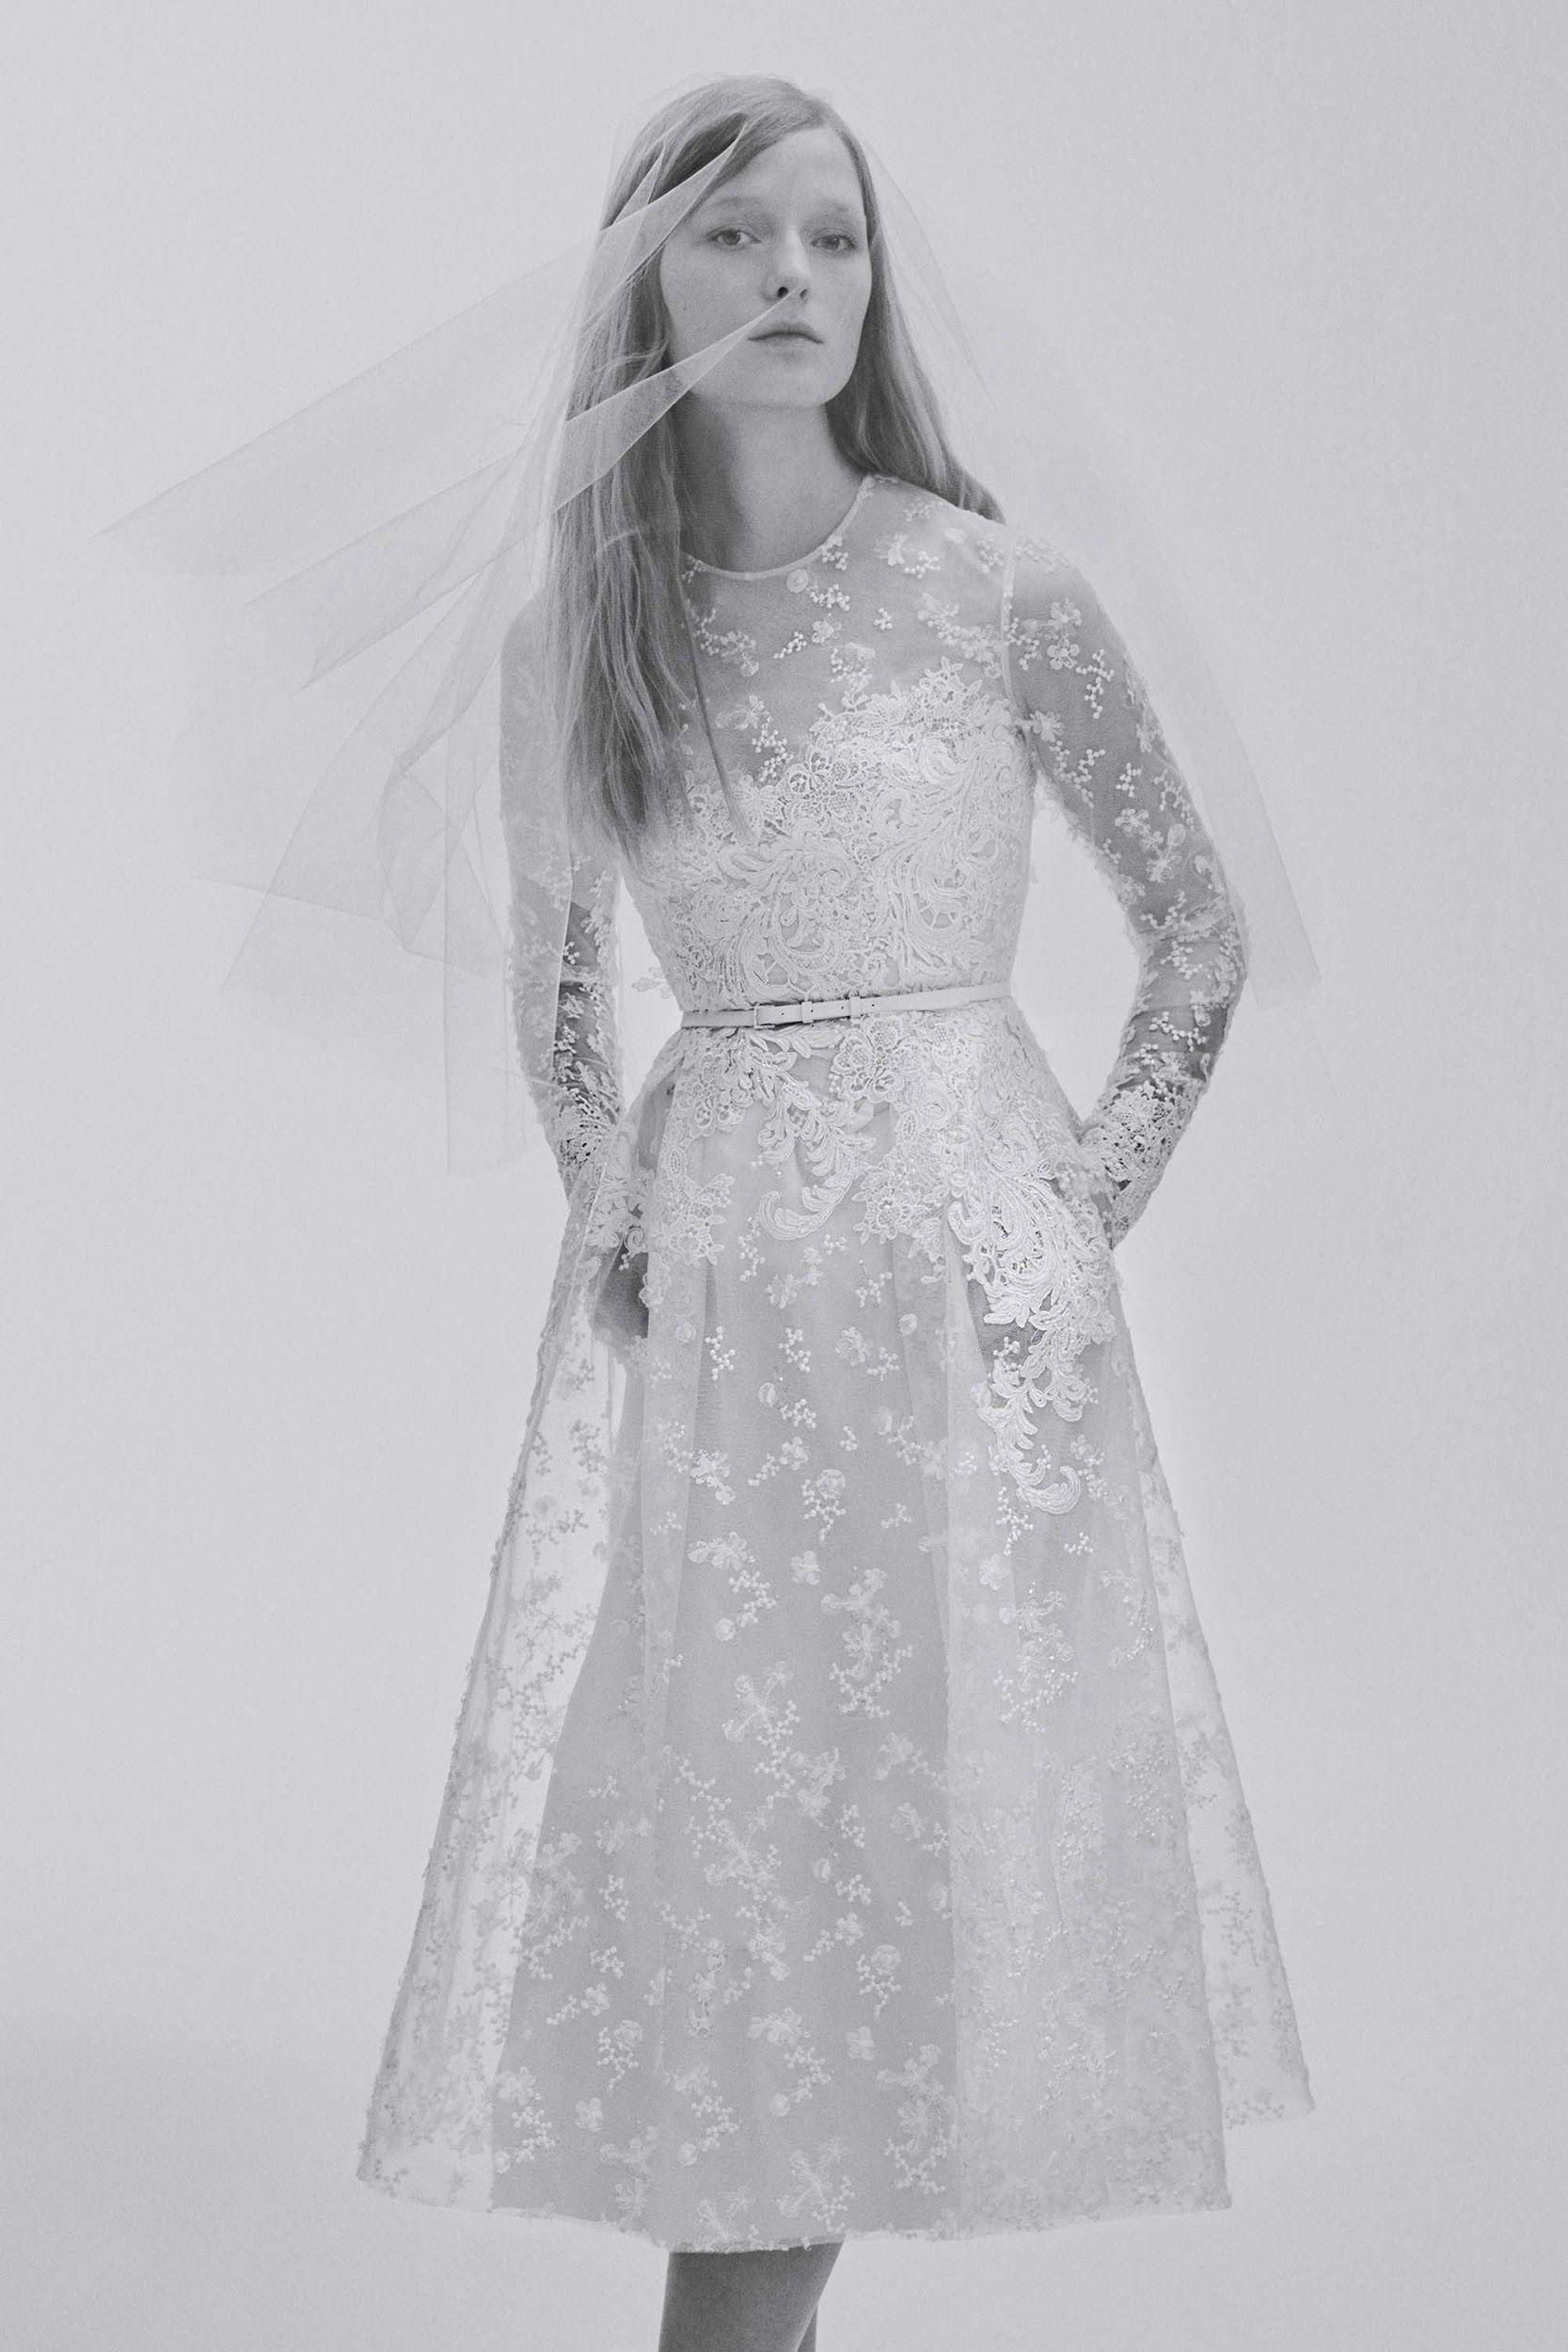 Zdroj fotky: http://www.vogue.com/fashion-shows/bridal-spring-2017/elie-saab/slideshow/collection#2